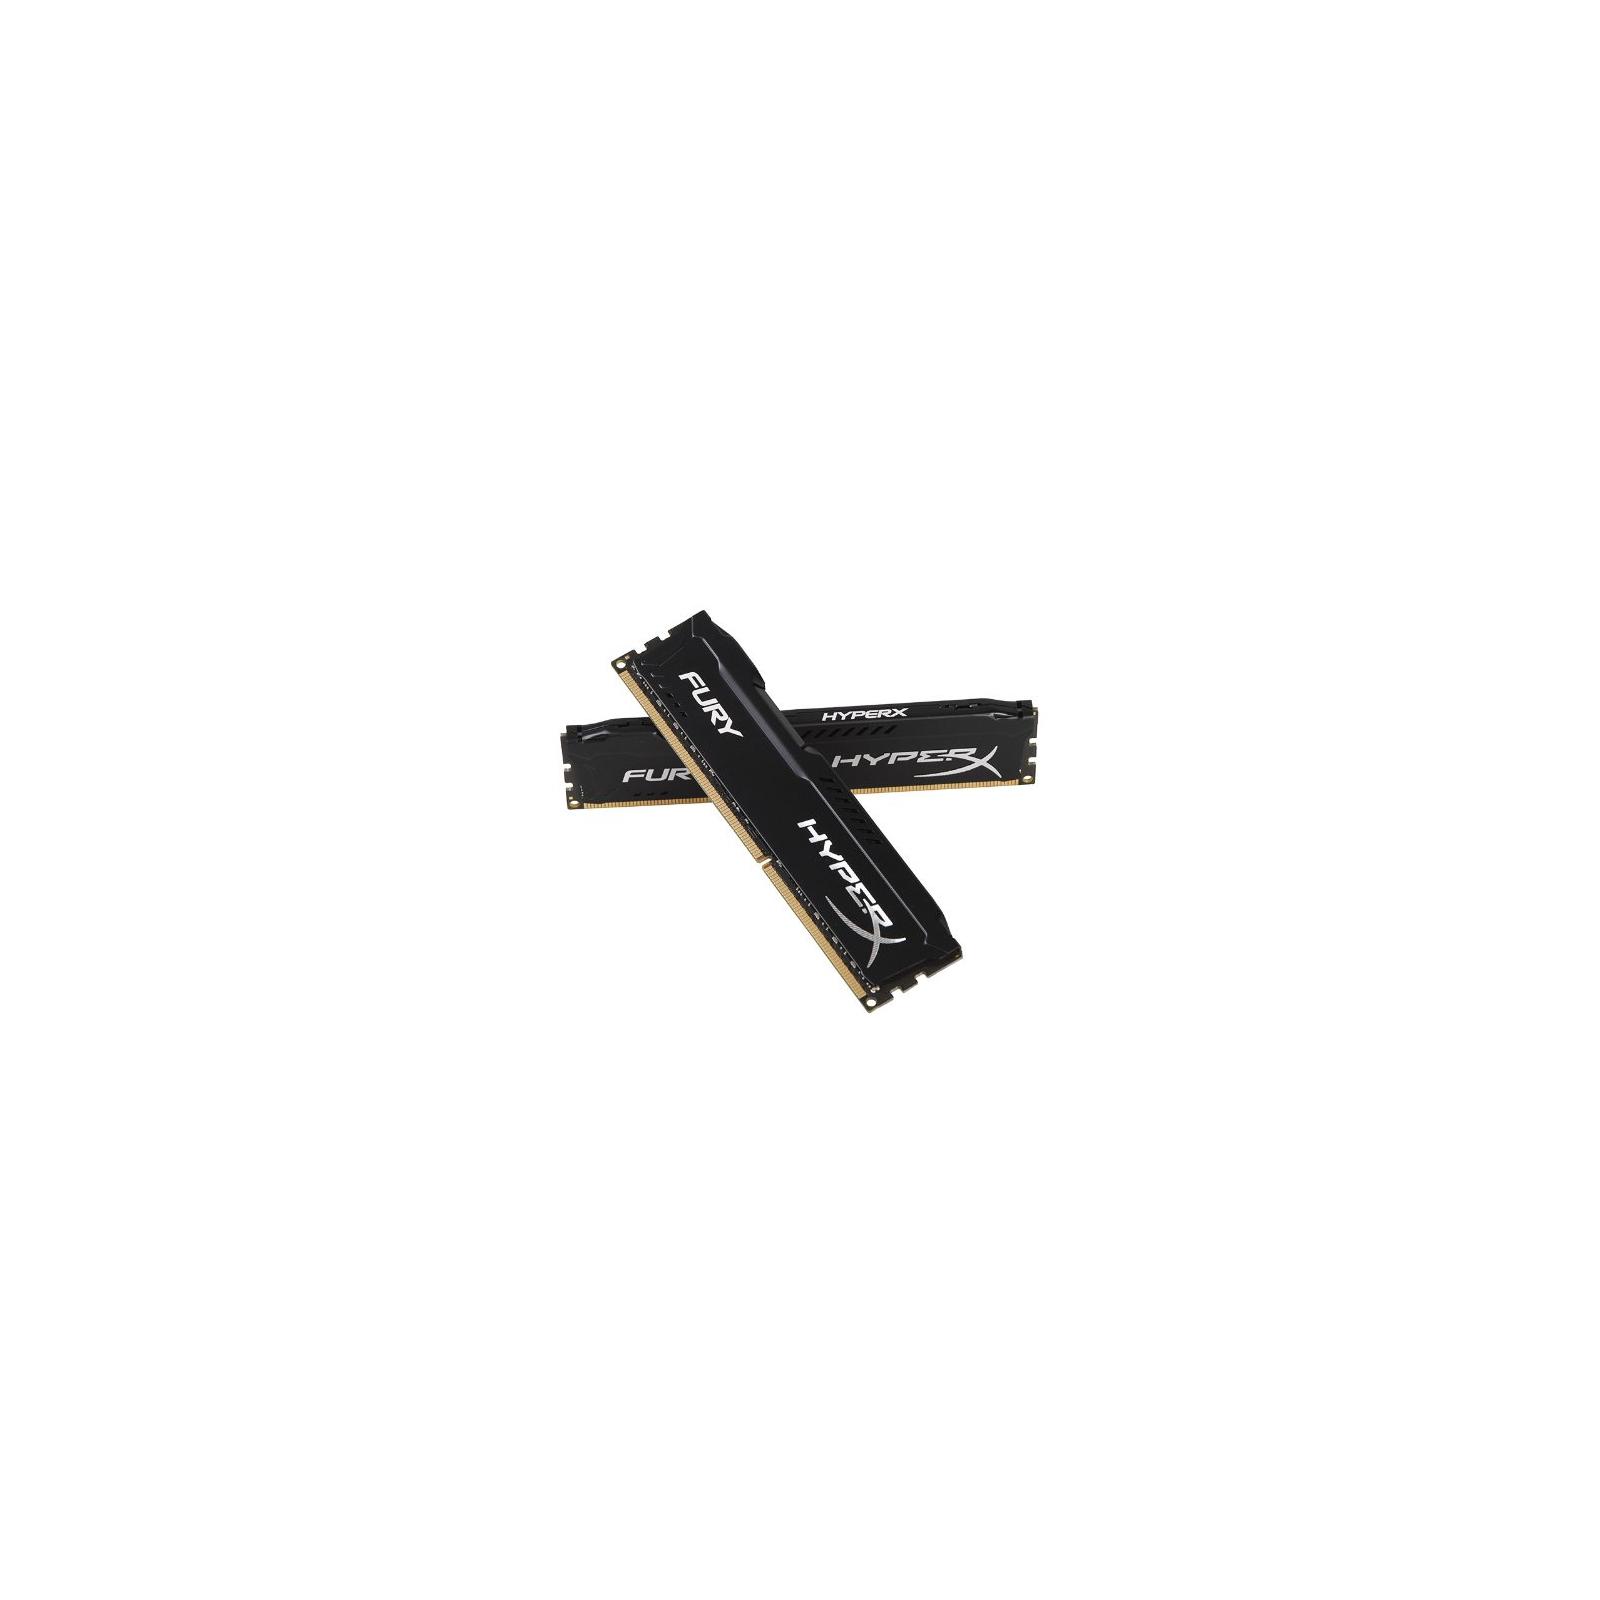 Модуль памяти для компьютера DDR3 8Gb (2x4GB) 1600 MHz HyperX Fury Black Kingston (HX316C10FBK2/8) изображение 3